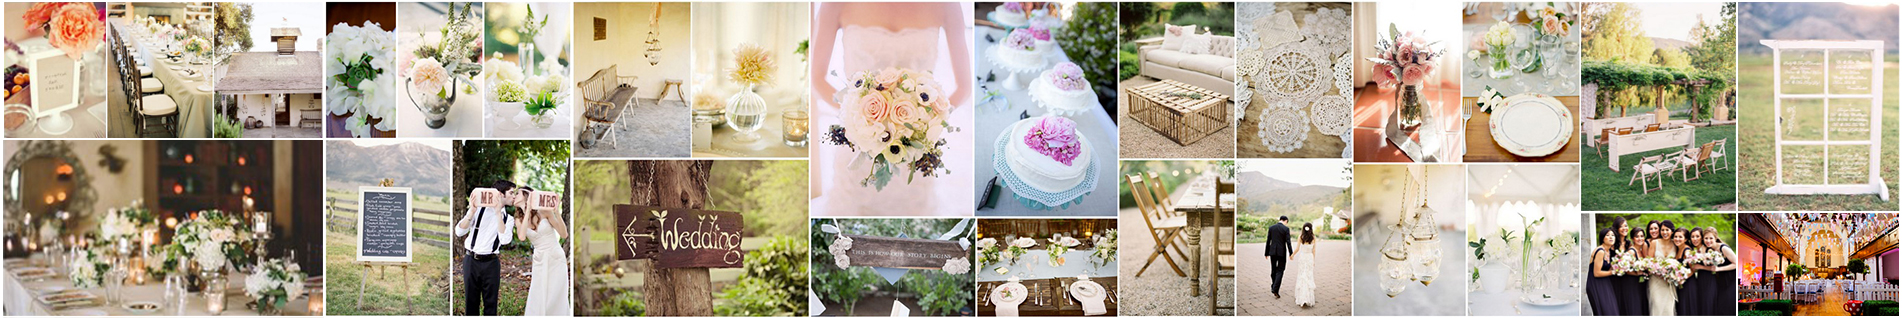 Wedding-Planning.jpg